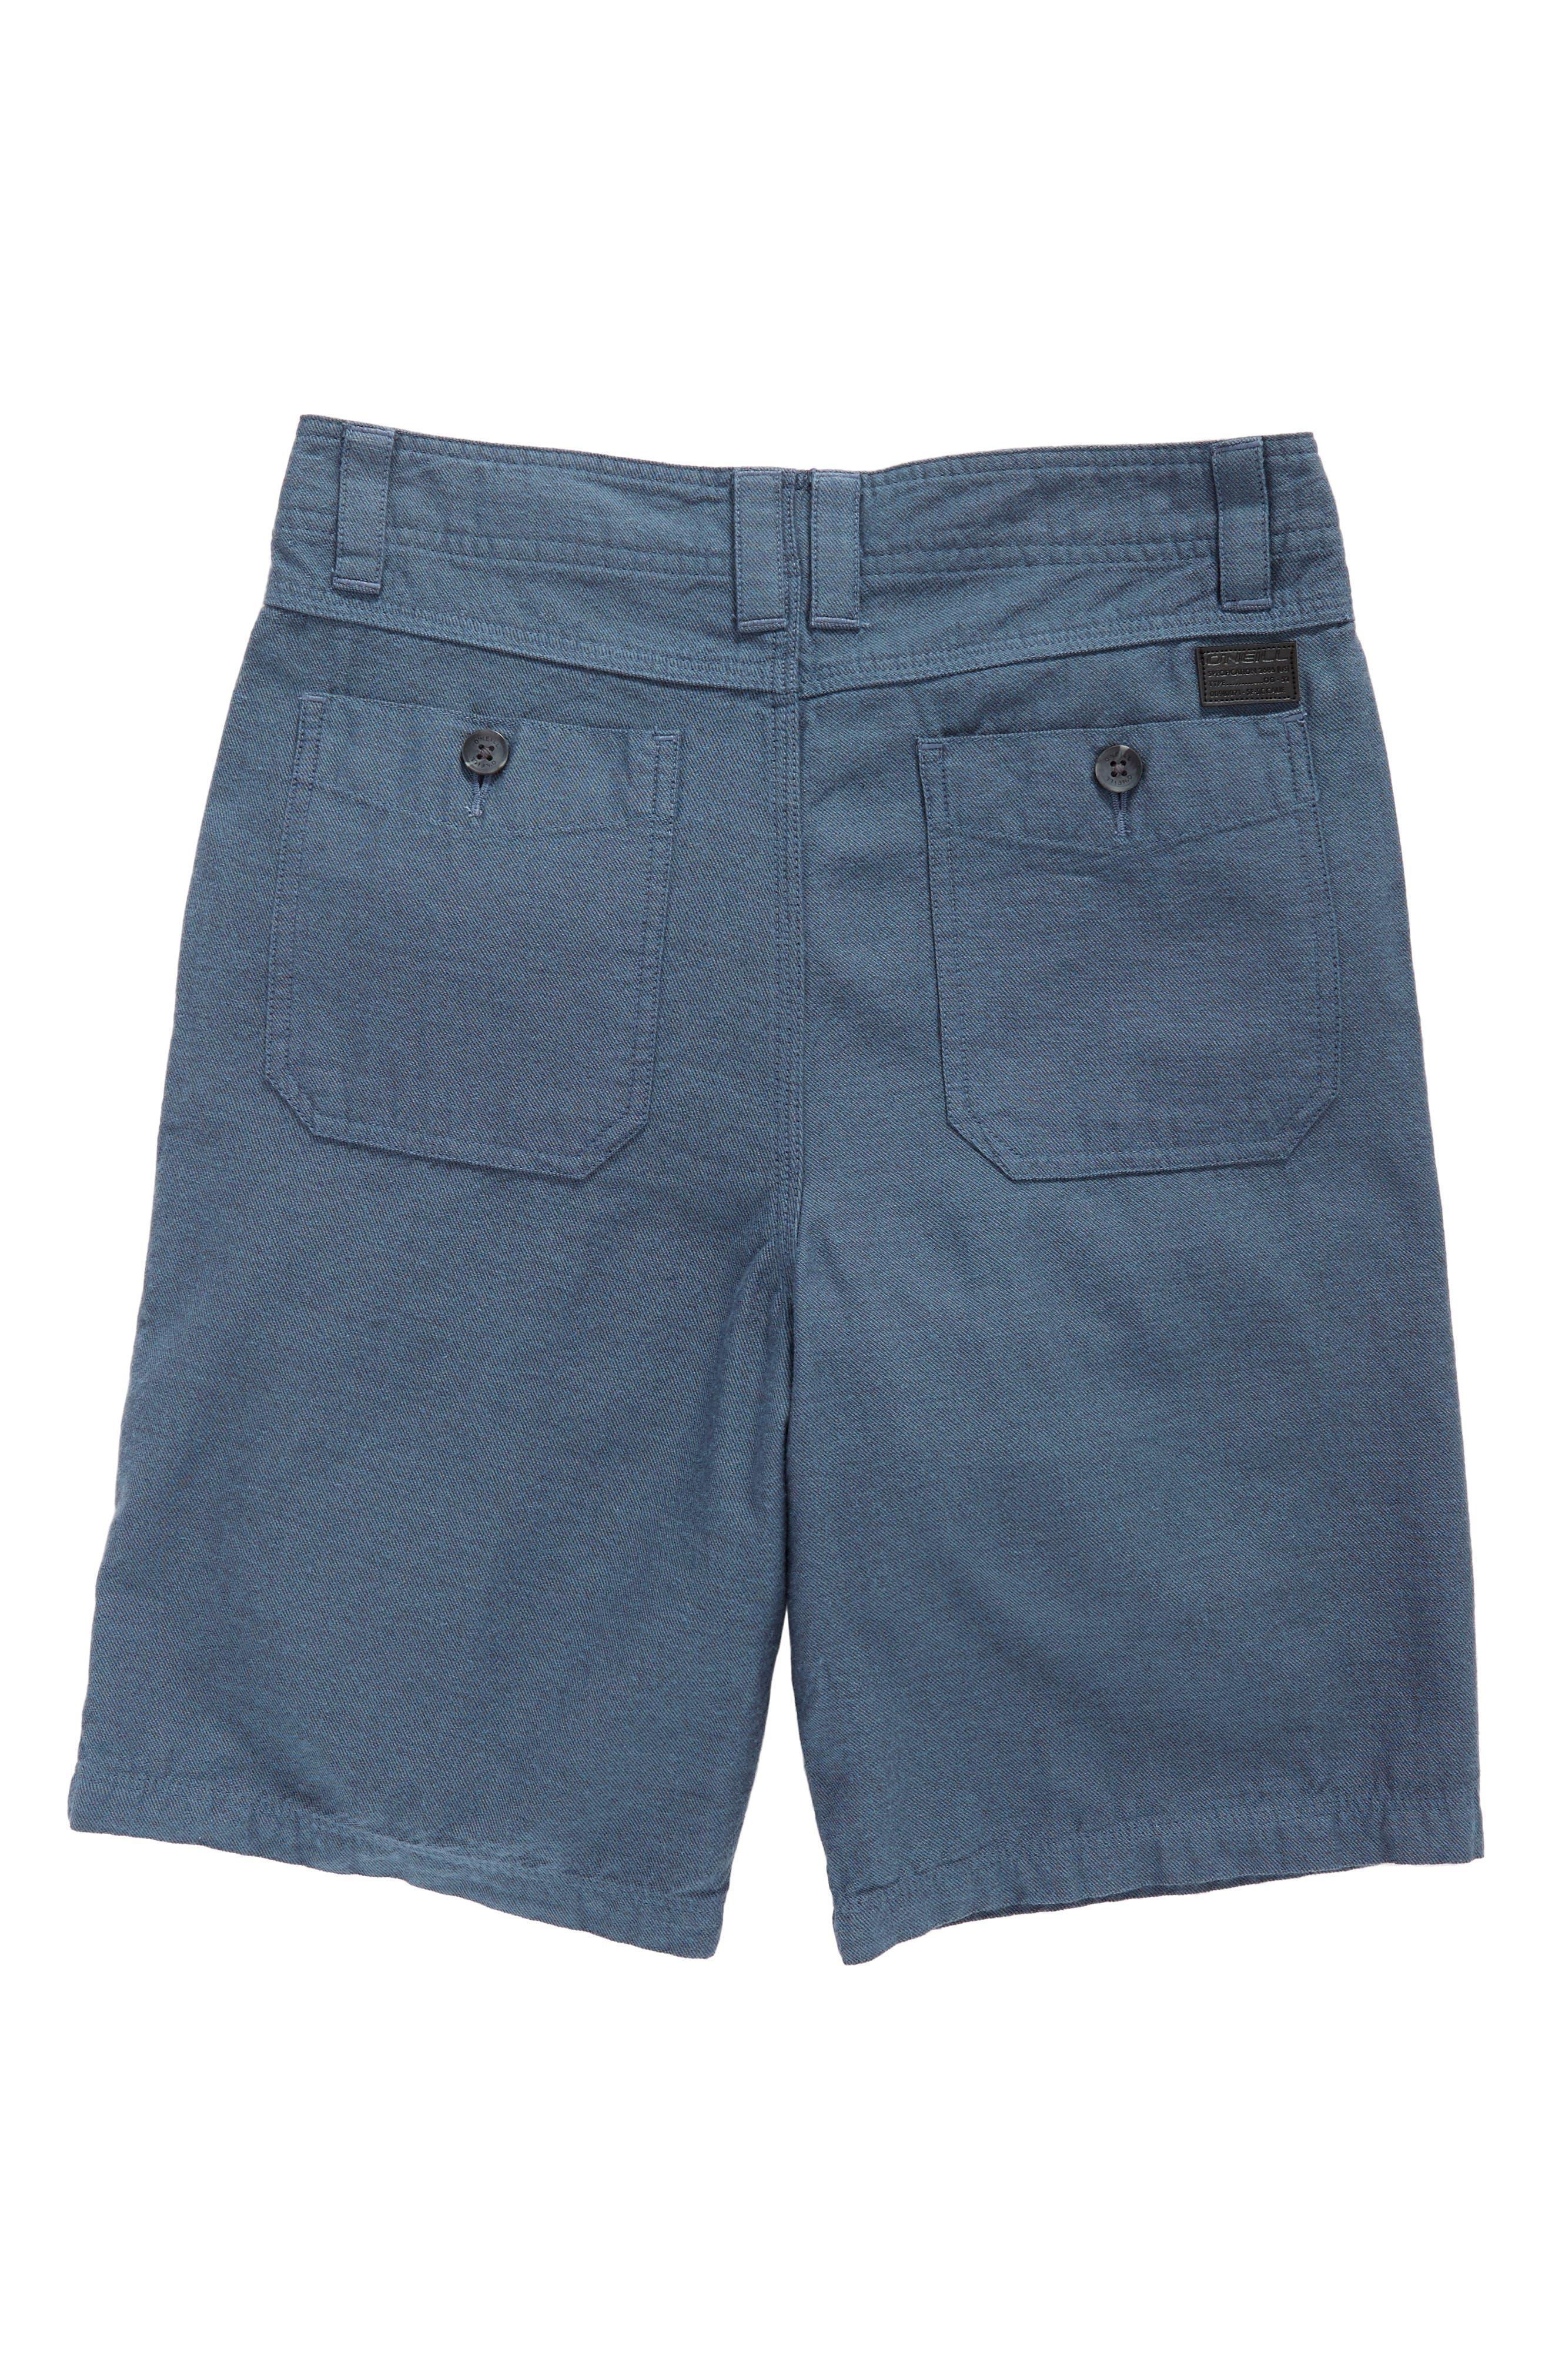 Alternate Image 2  - O'Neill Scranton Chino Shorts (Big Boys)